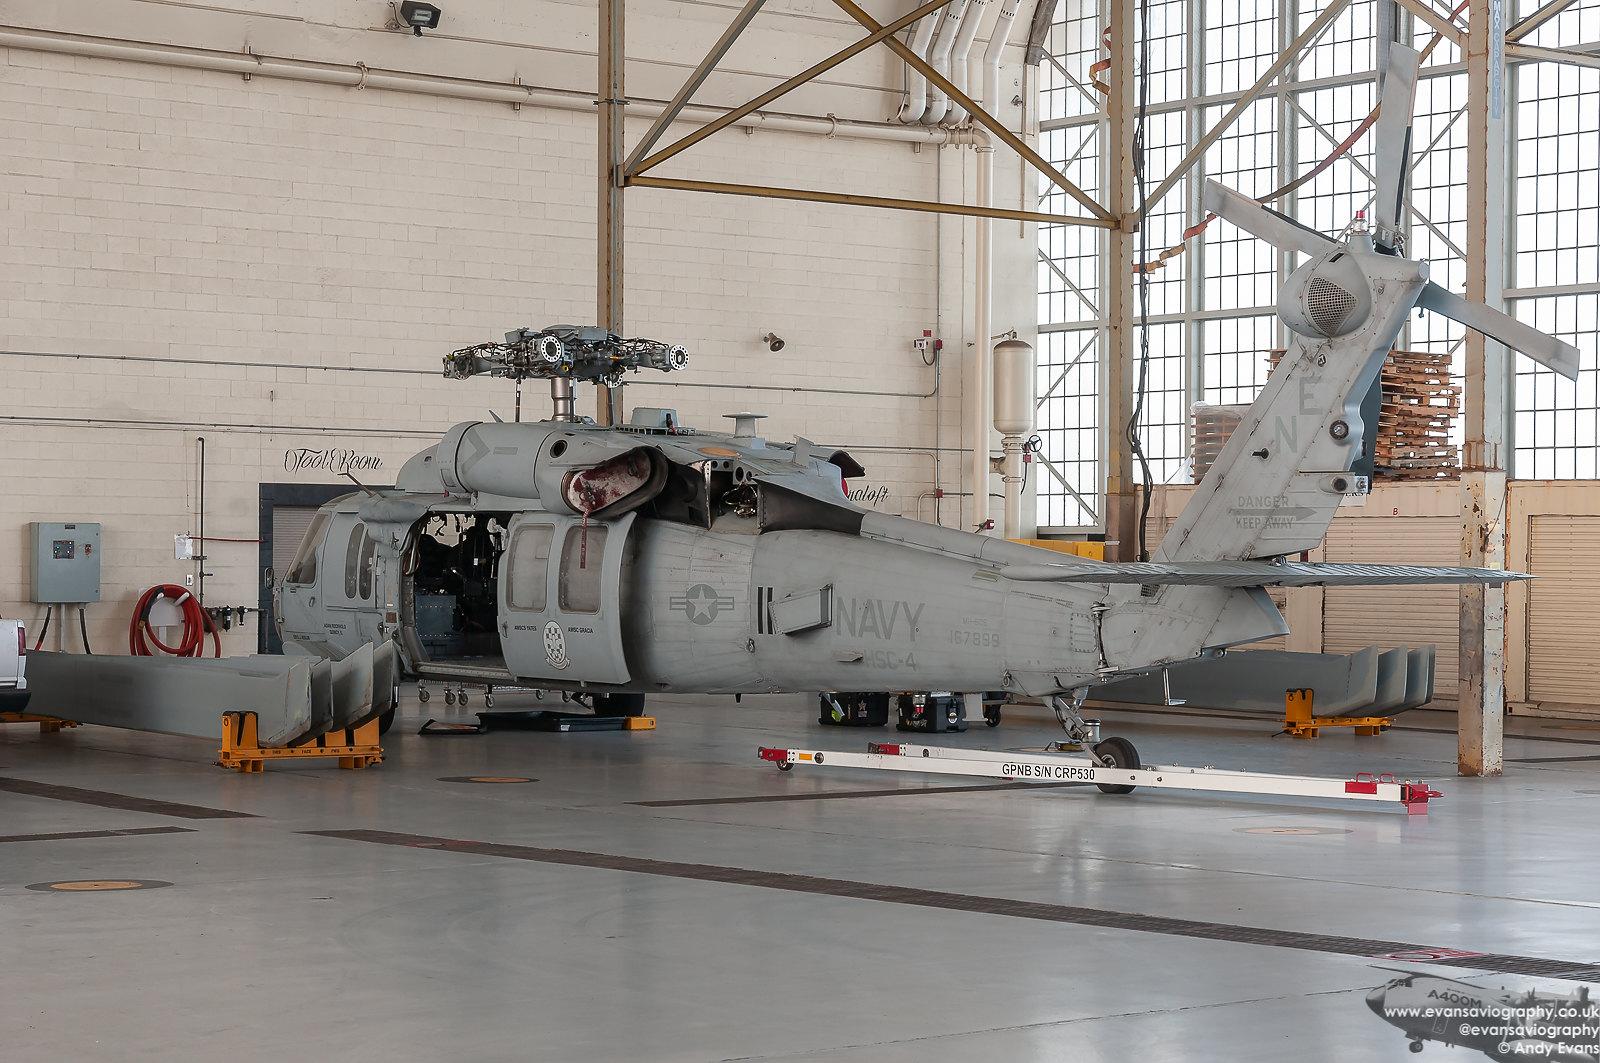 167899 MH-60S HSC-4